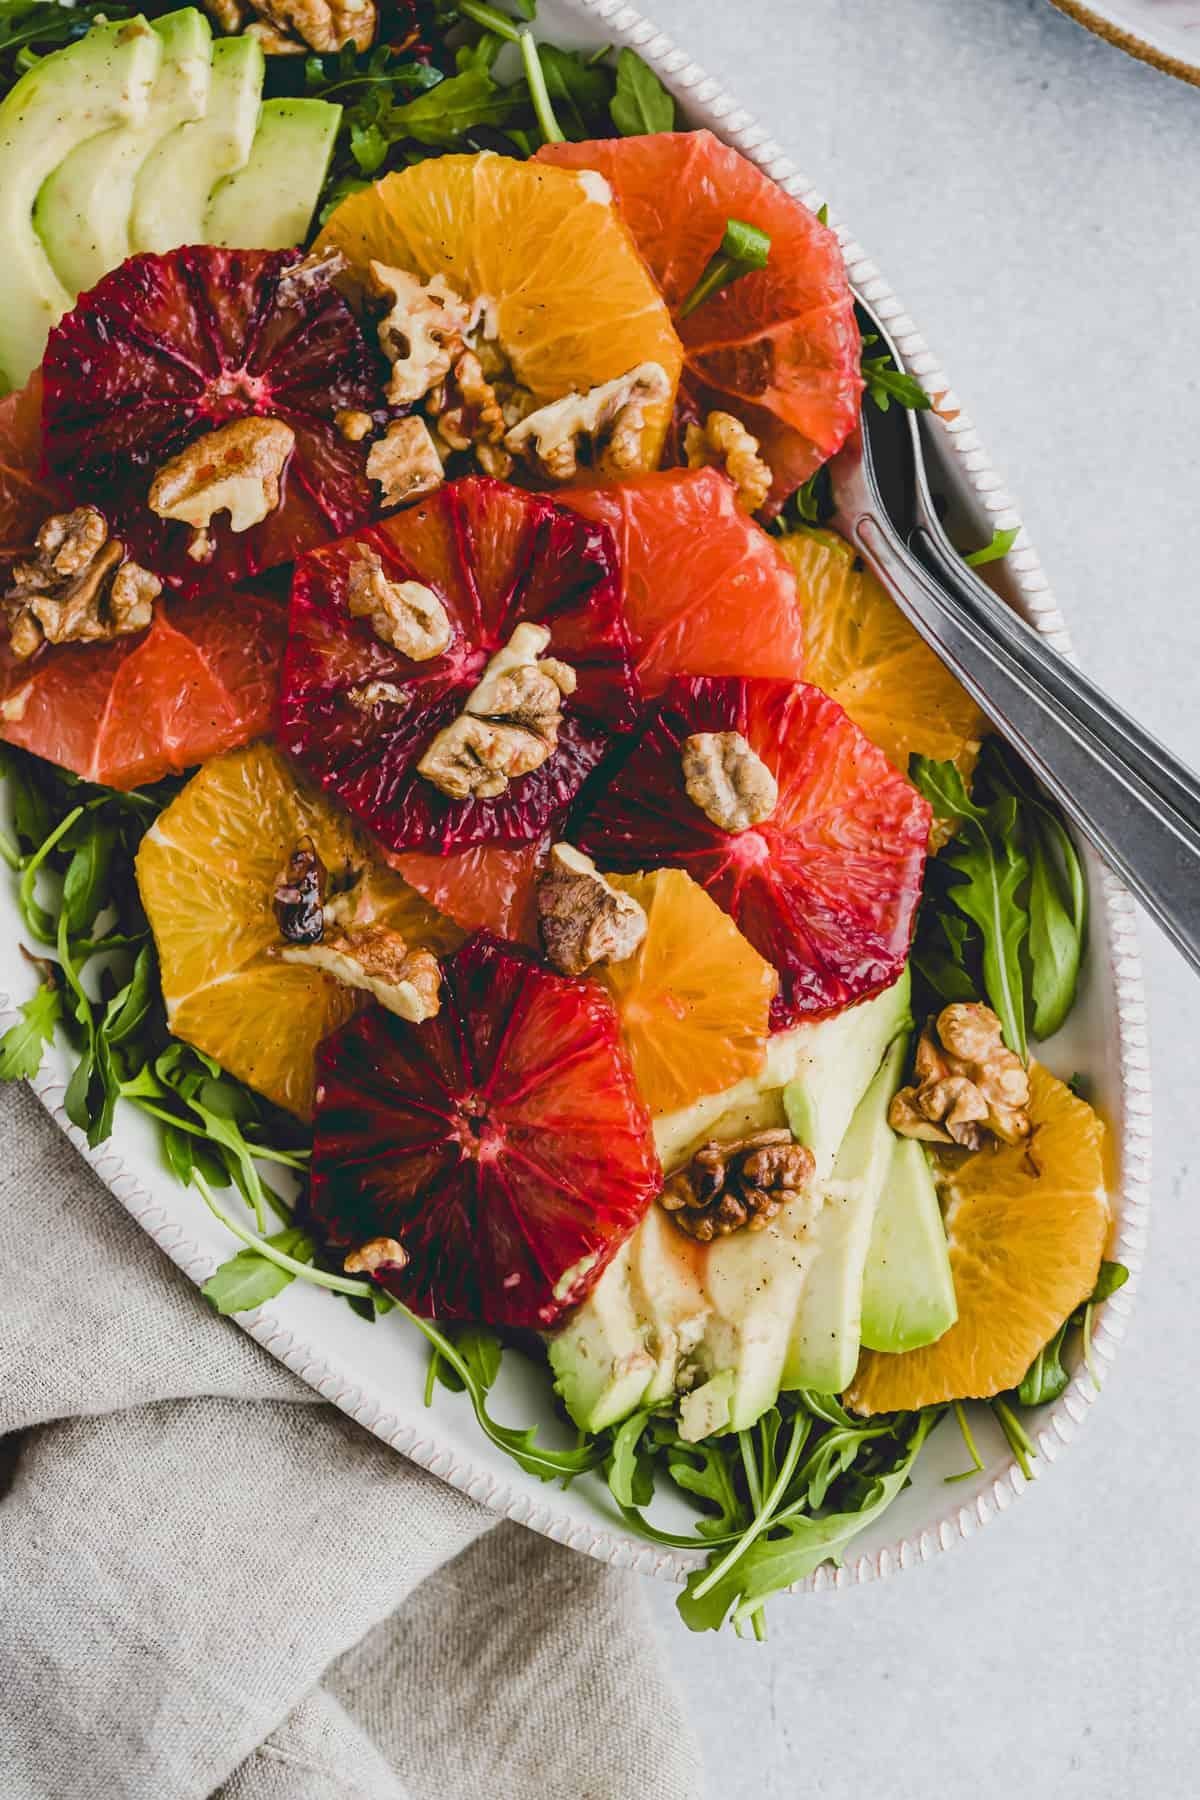 winter citrus salad with arugula